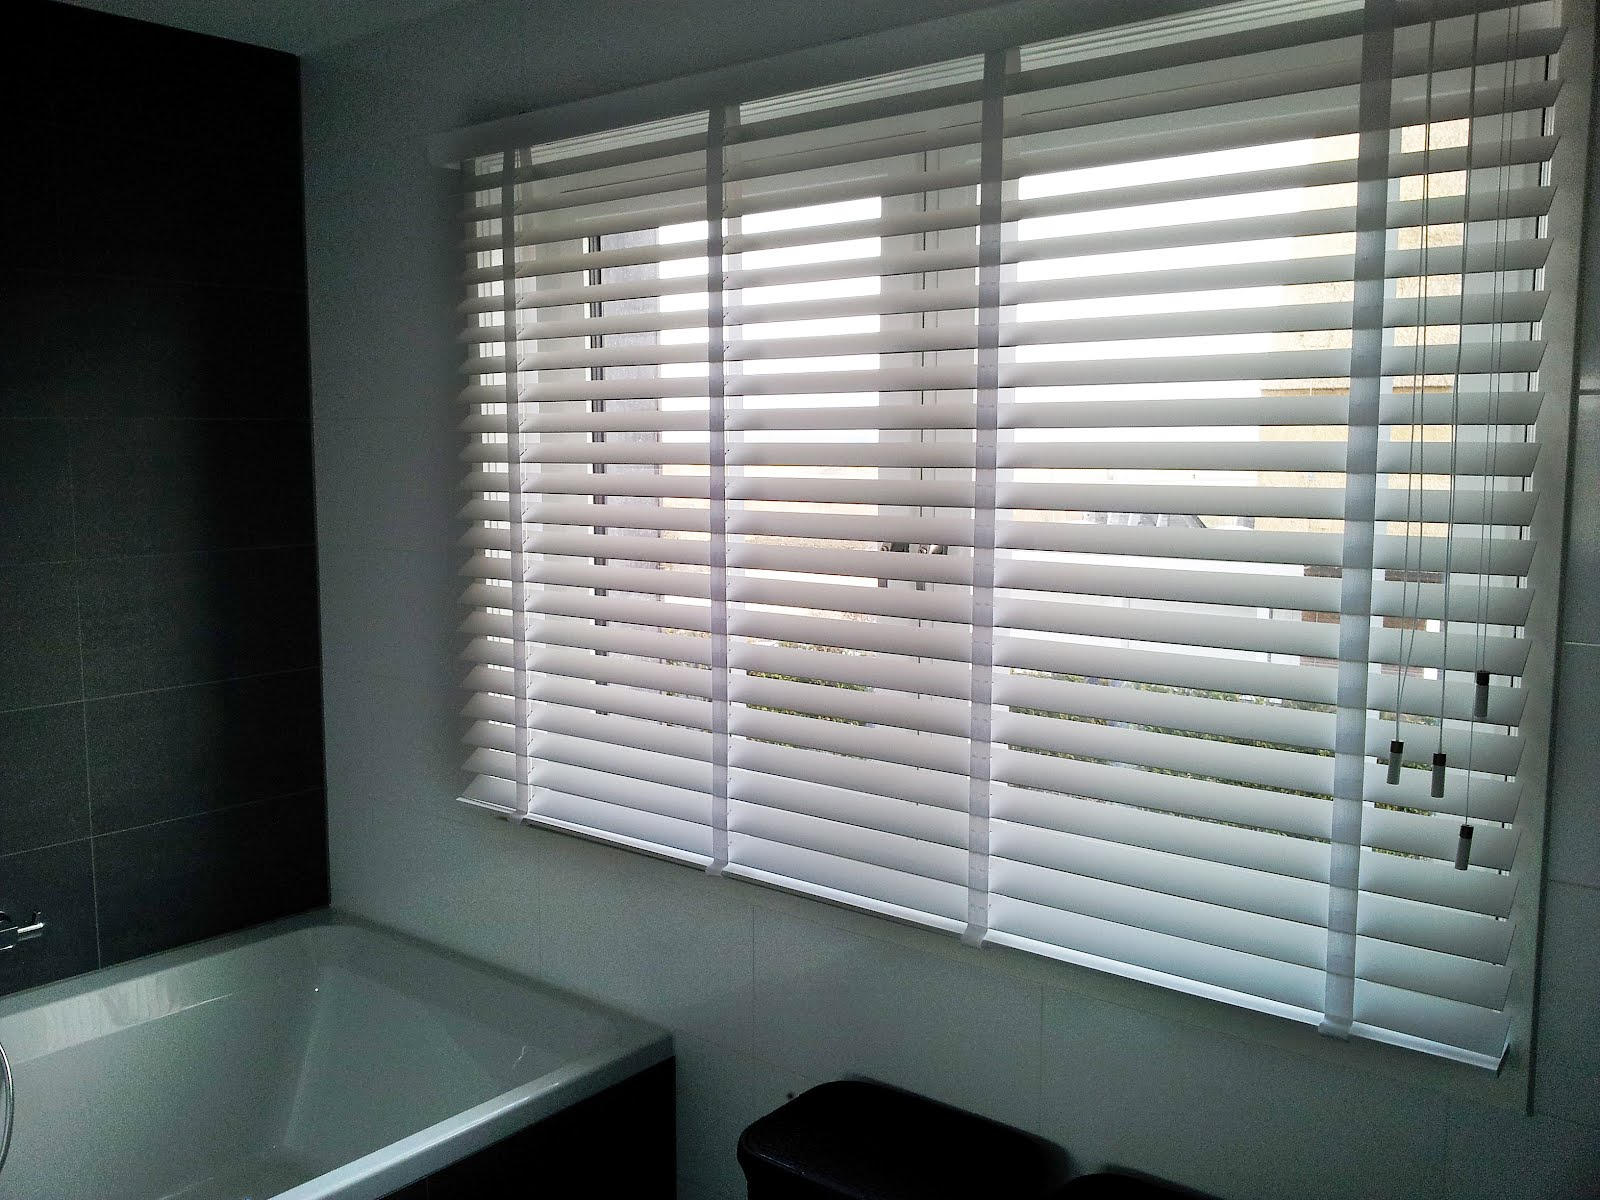 Lamellen ikea Raamdecoratie u0026 raambekleding online